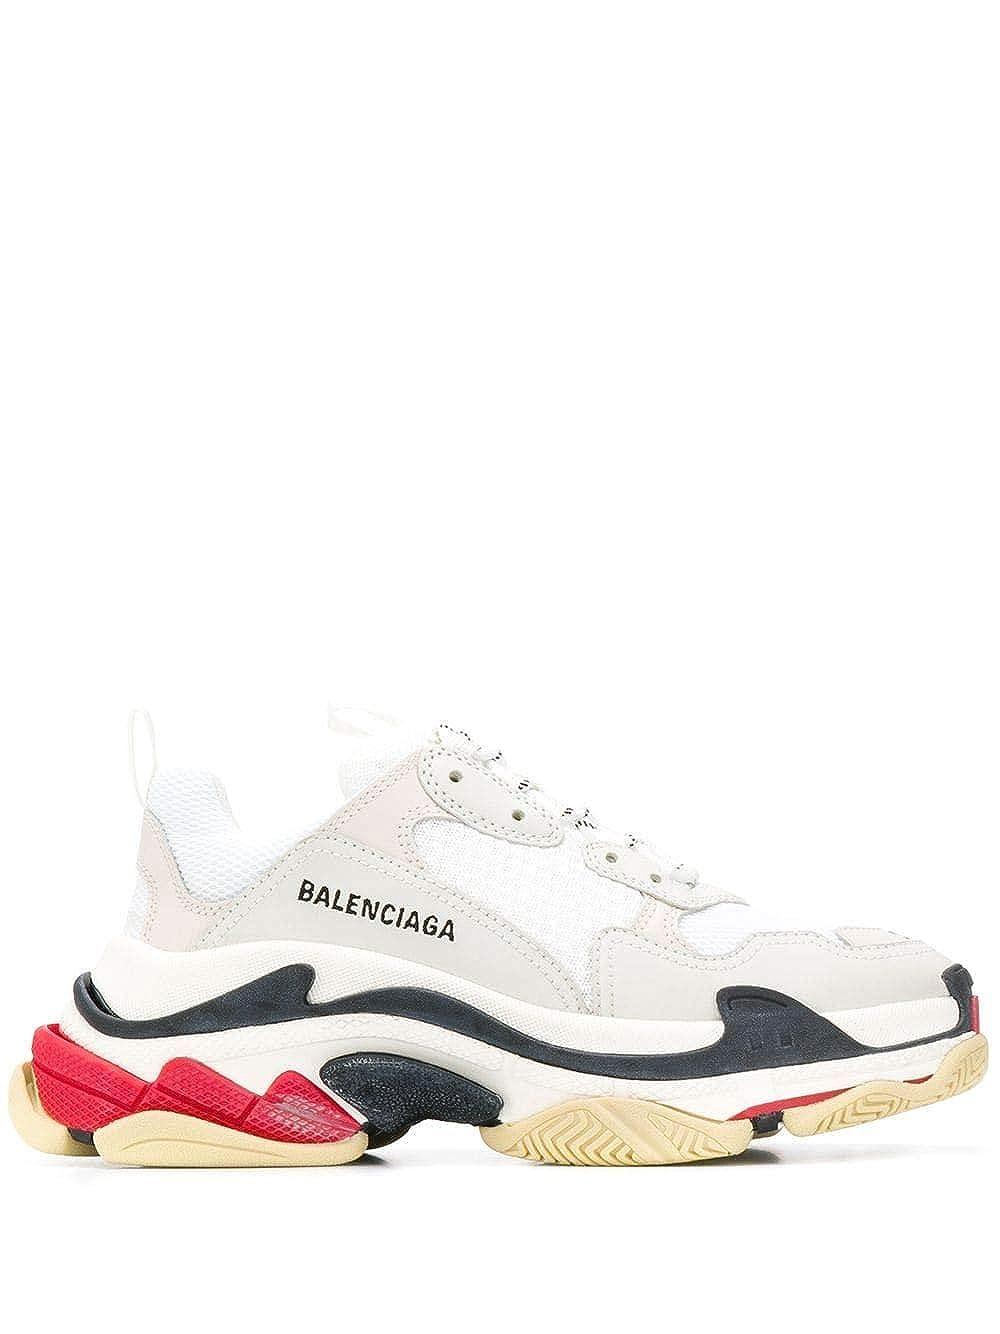 Balenciaga Fashion Mens 533882W09E19000 White Sneakers